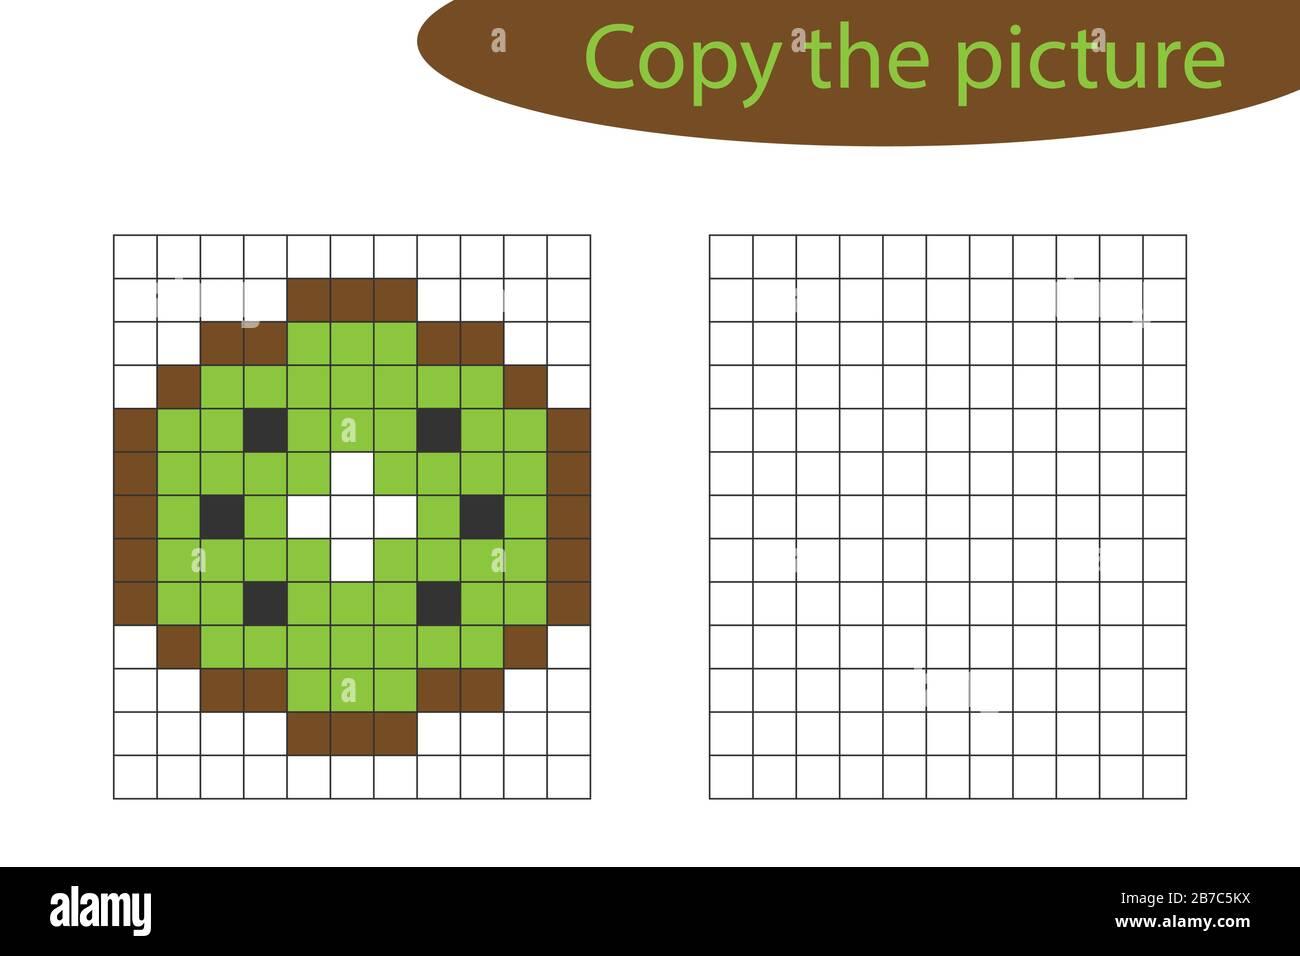 Copy The Picture Pixel Art Kiwi Cartoon Drawing Skills Training Educational Paper Game For The Development Of Children Kids Preschool Activity Stock Vector Image Art Alamy